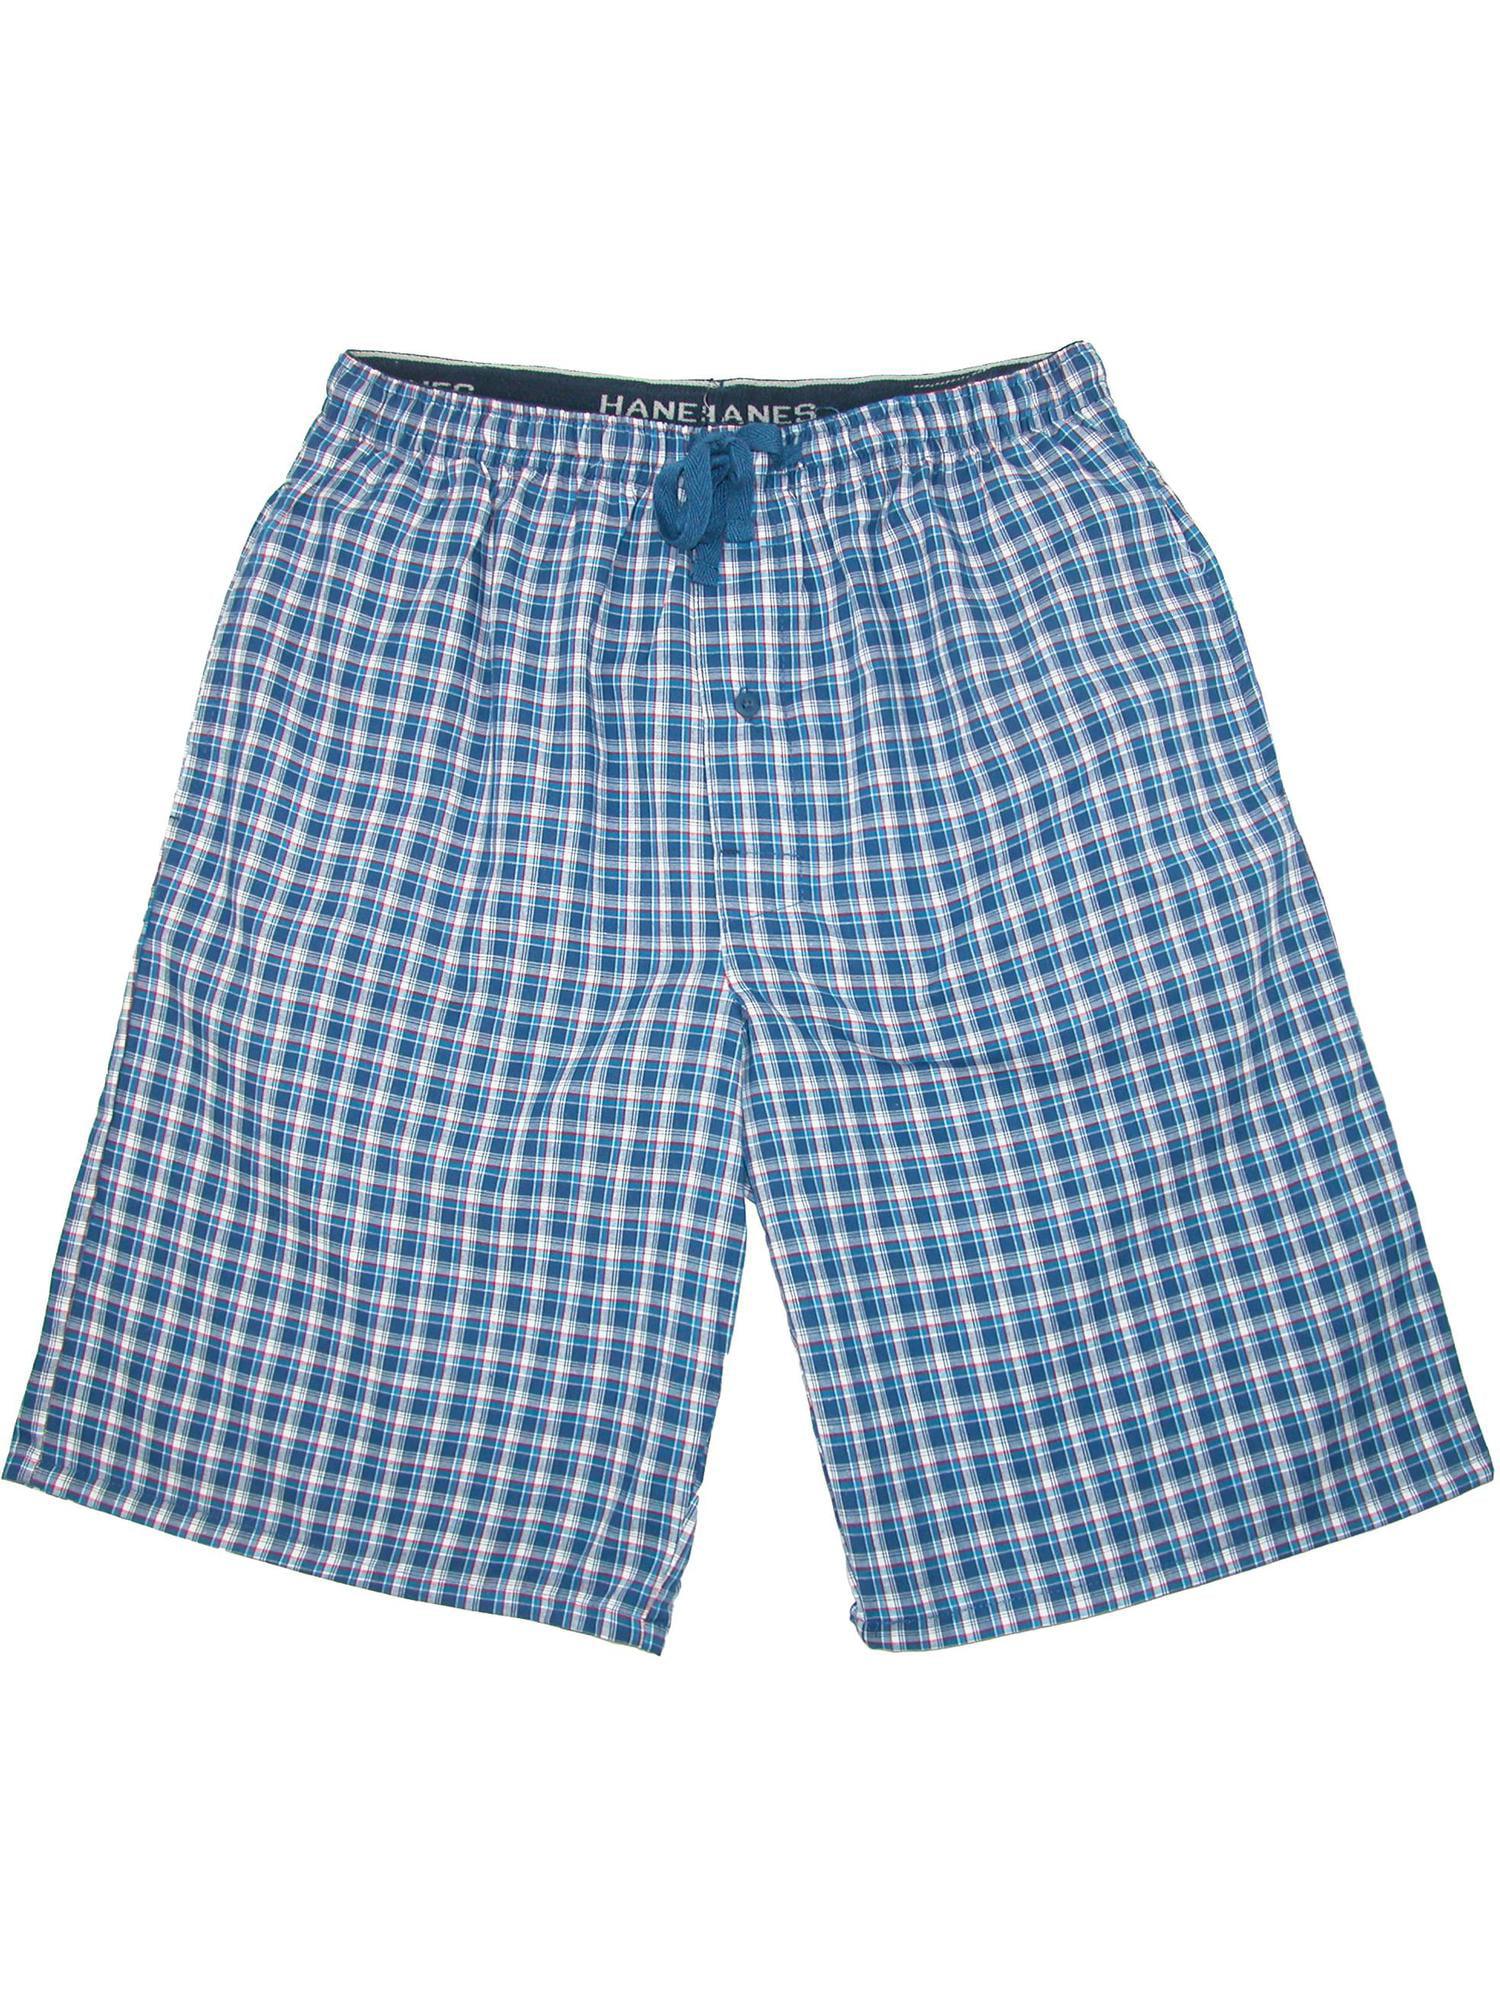 Men's Big and Tall Madras Sleep Pajama Shorts